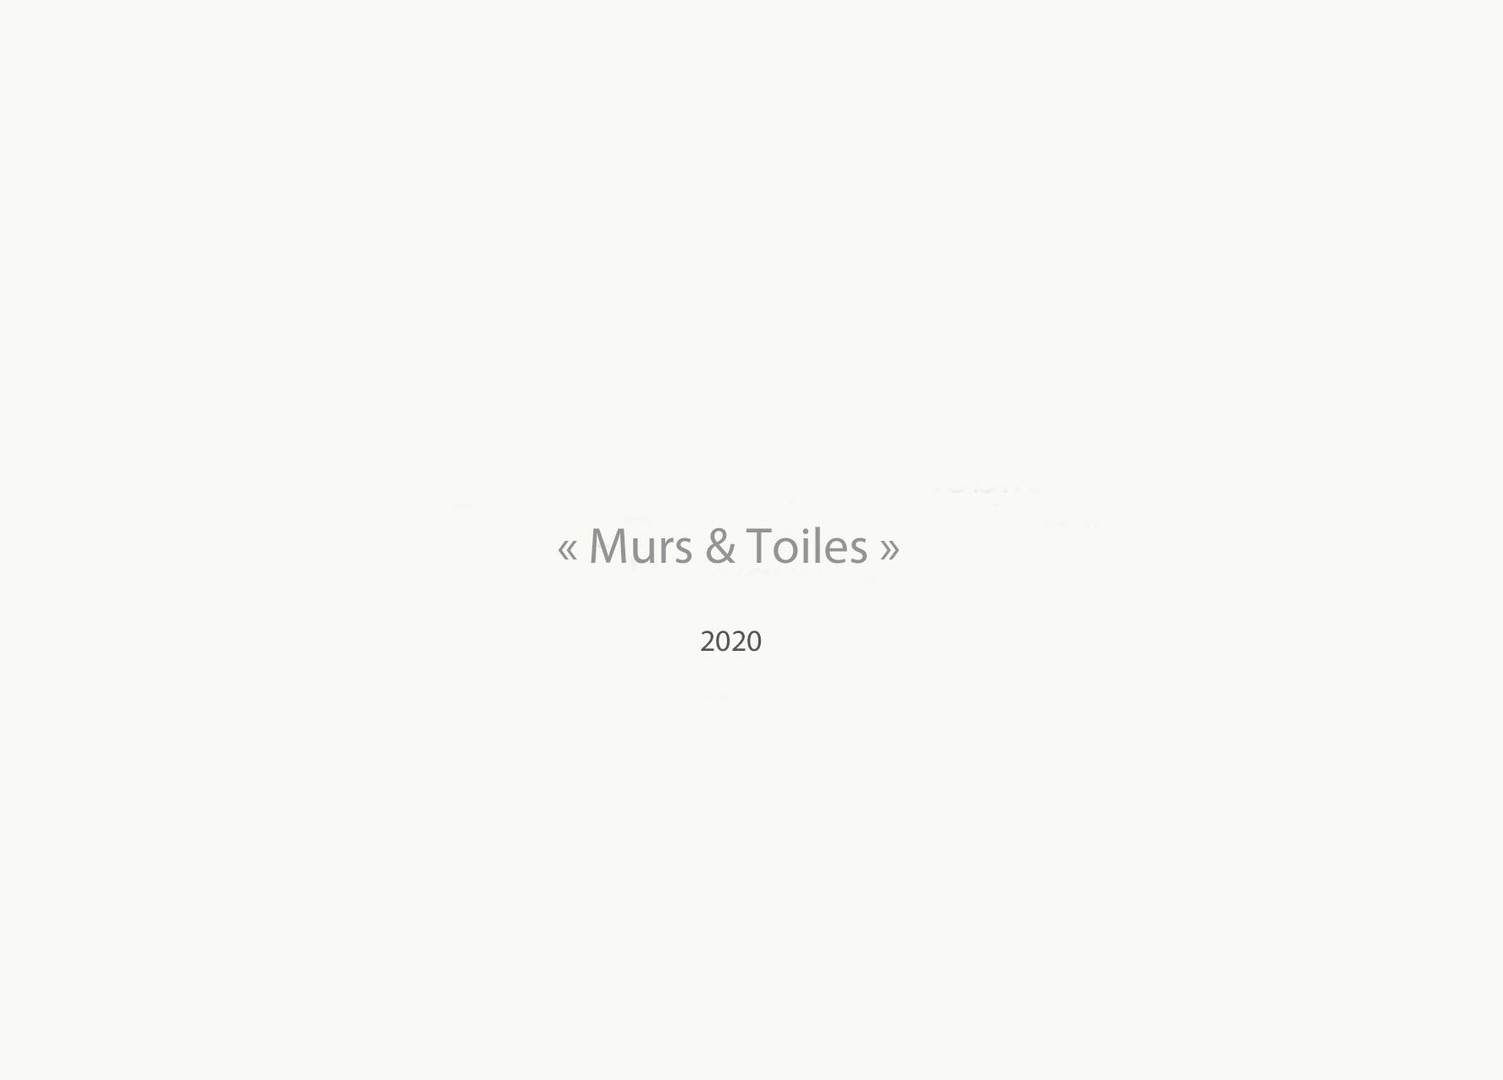 Murs & Toiles